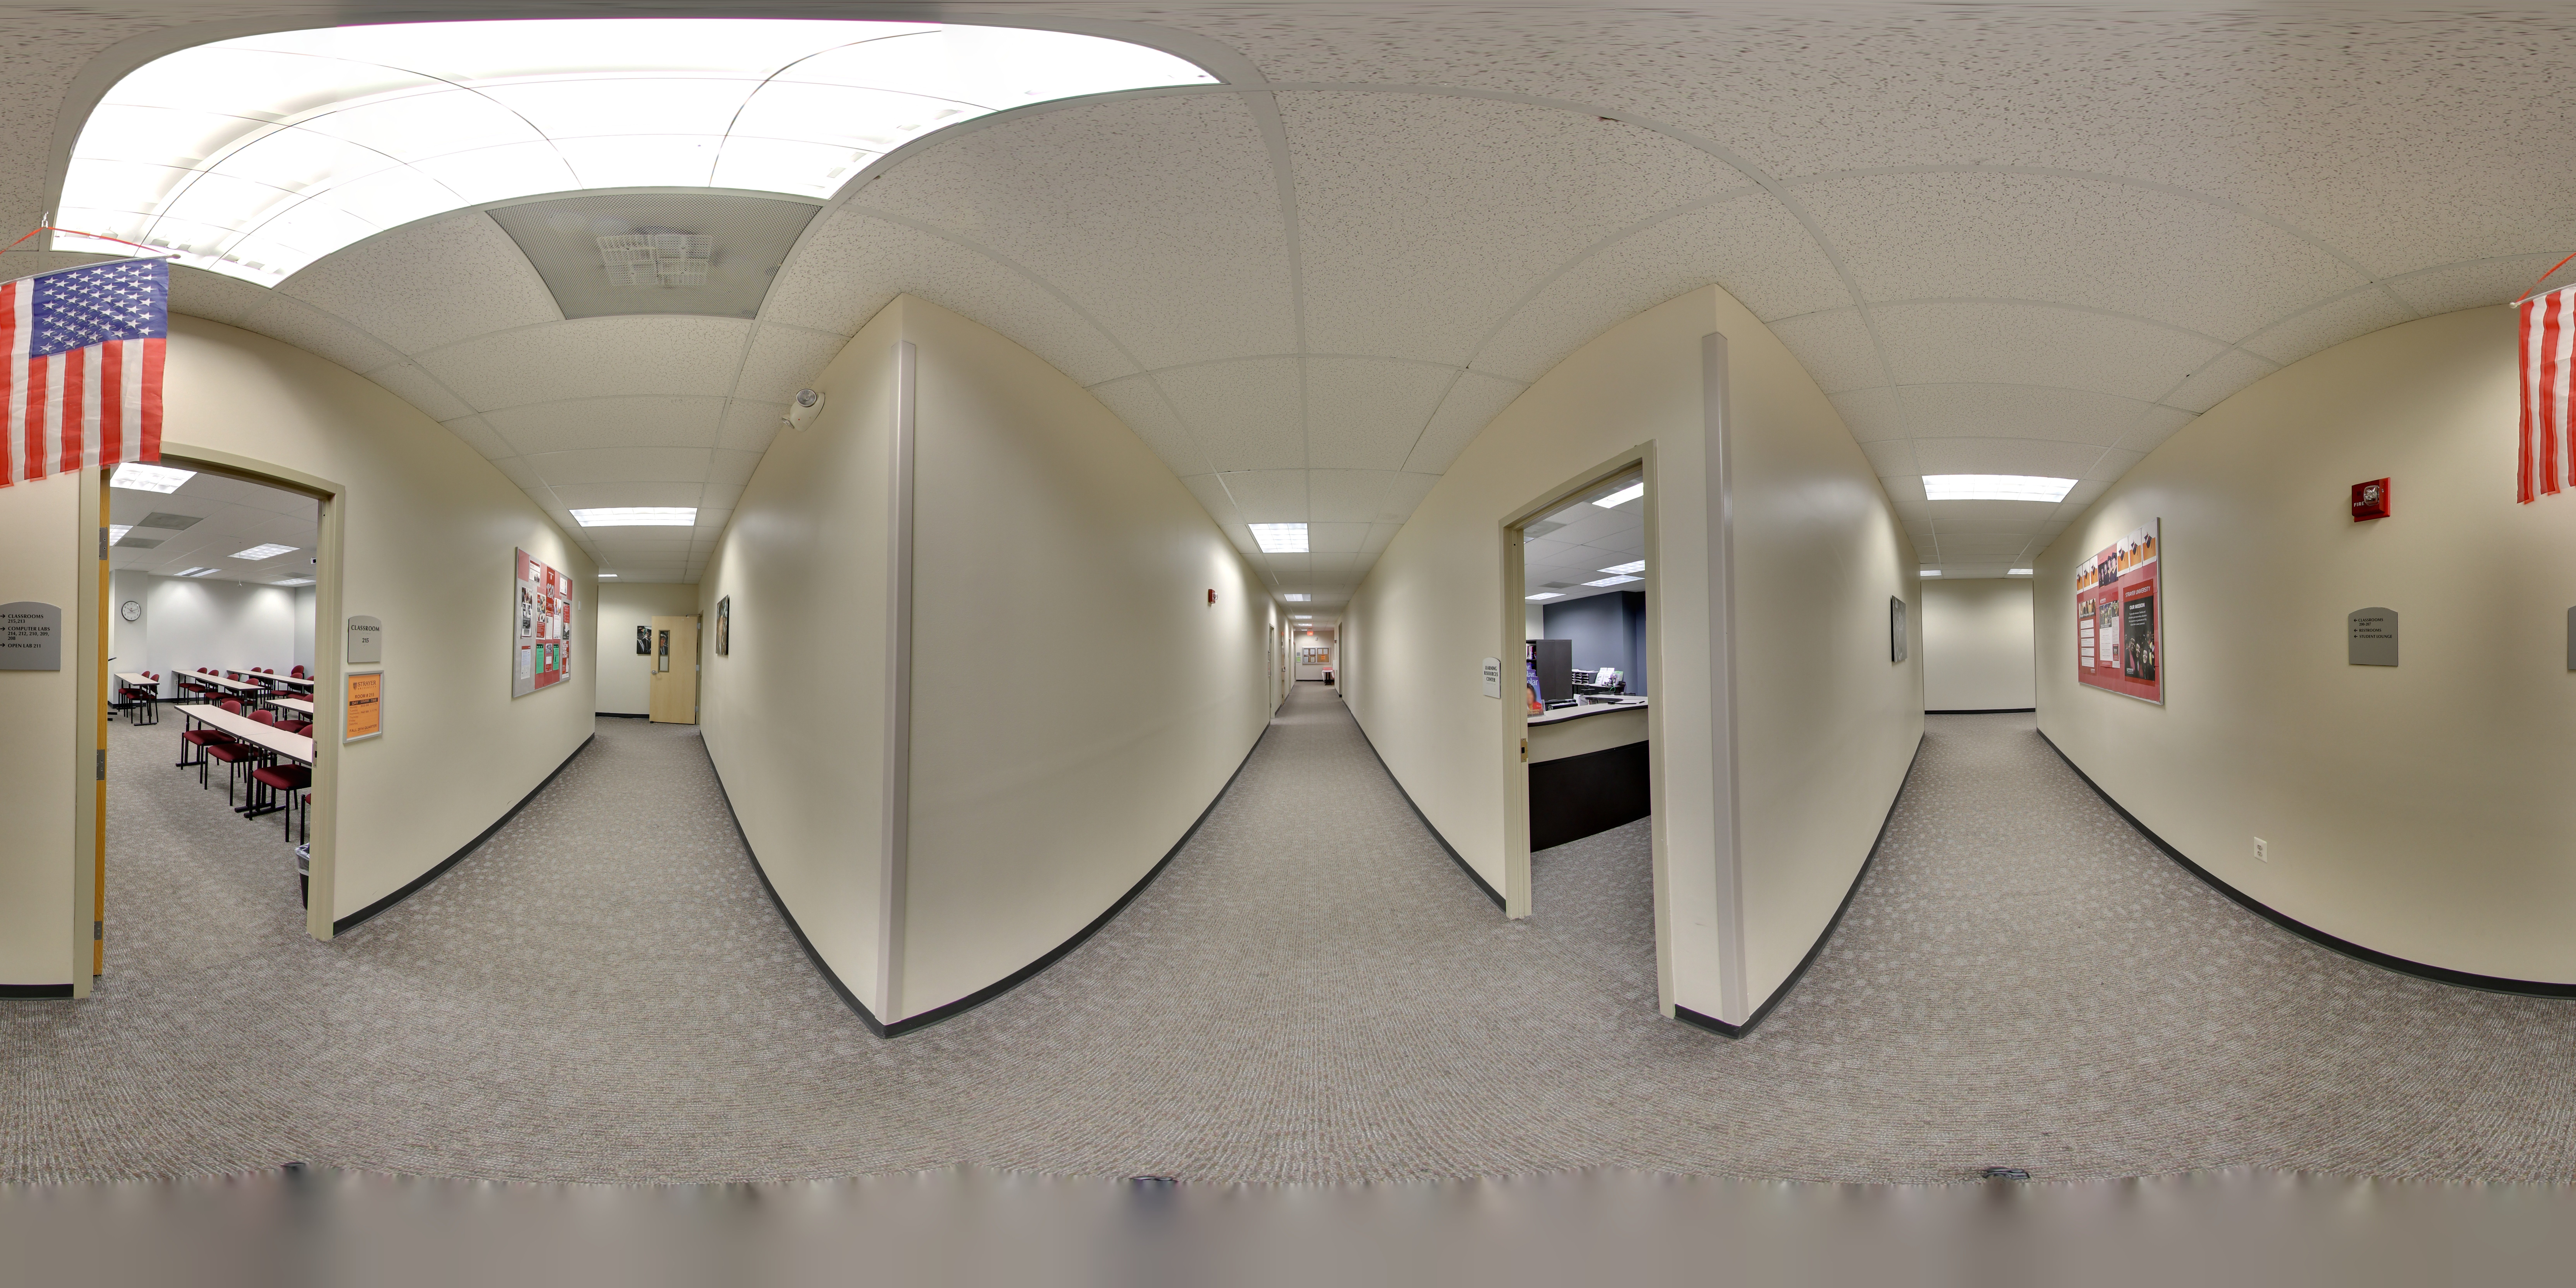 Strayer University image 6